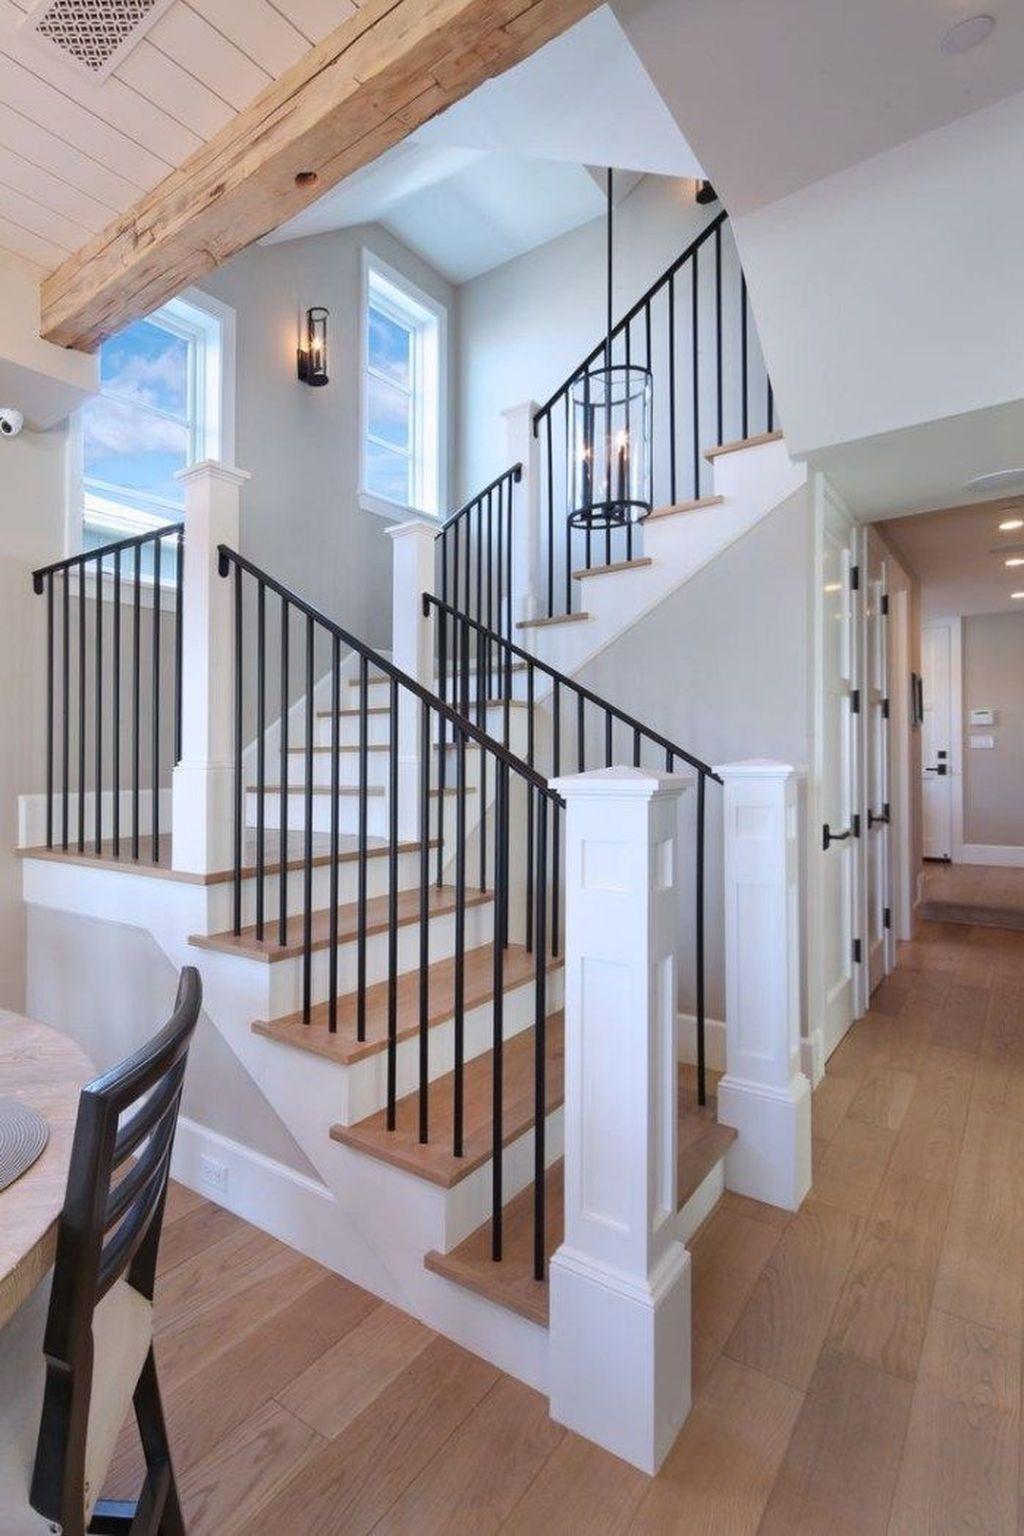 Stunning Farmhouse Interior Design Ideas To Realize Your Dreams 17